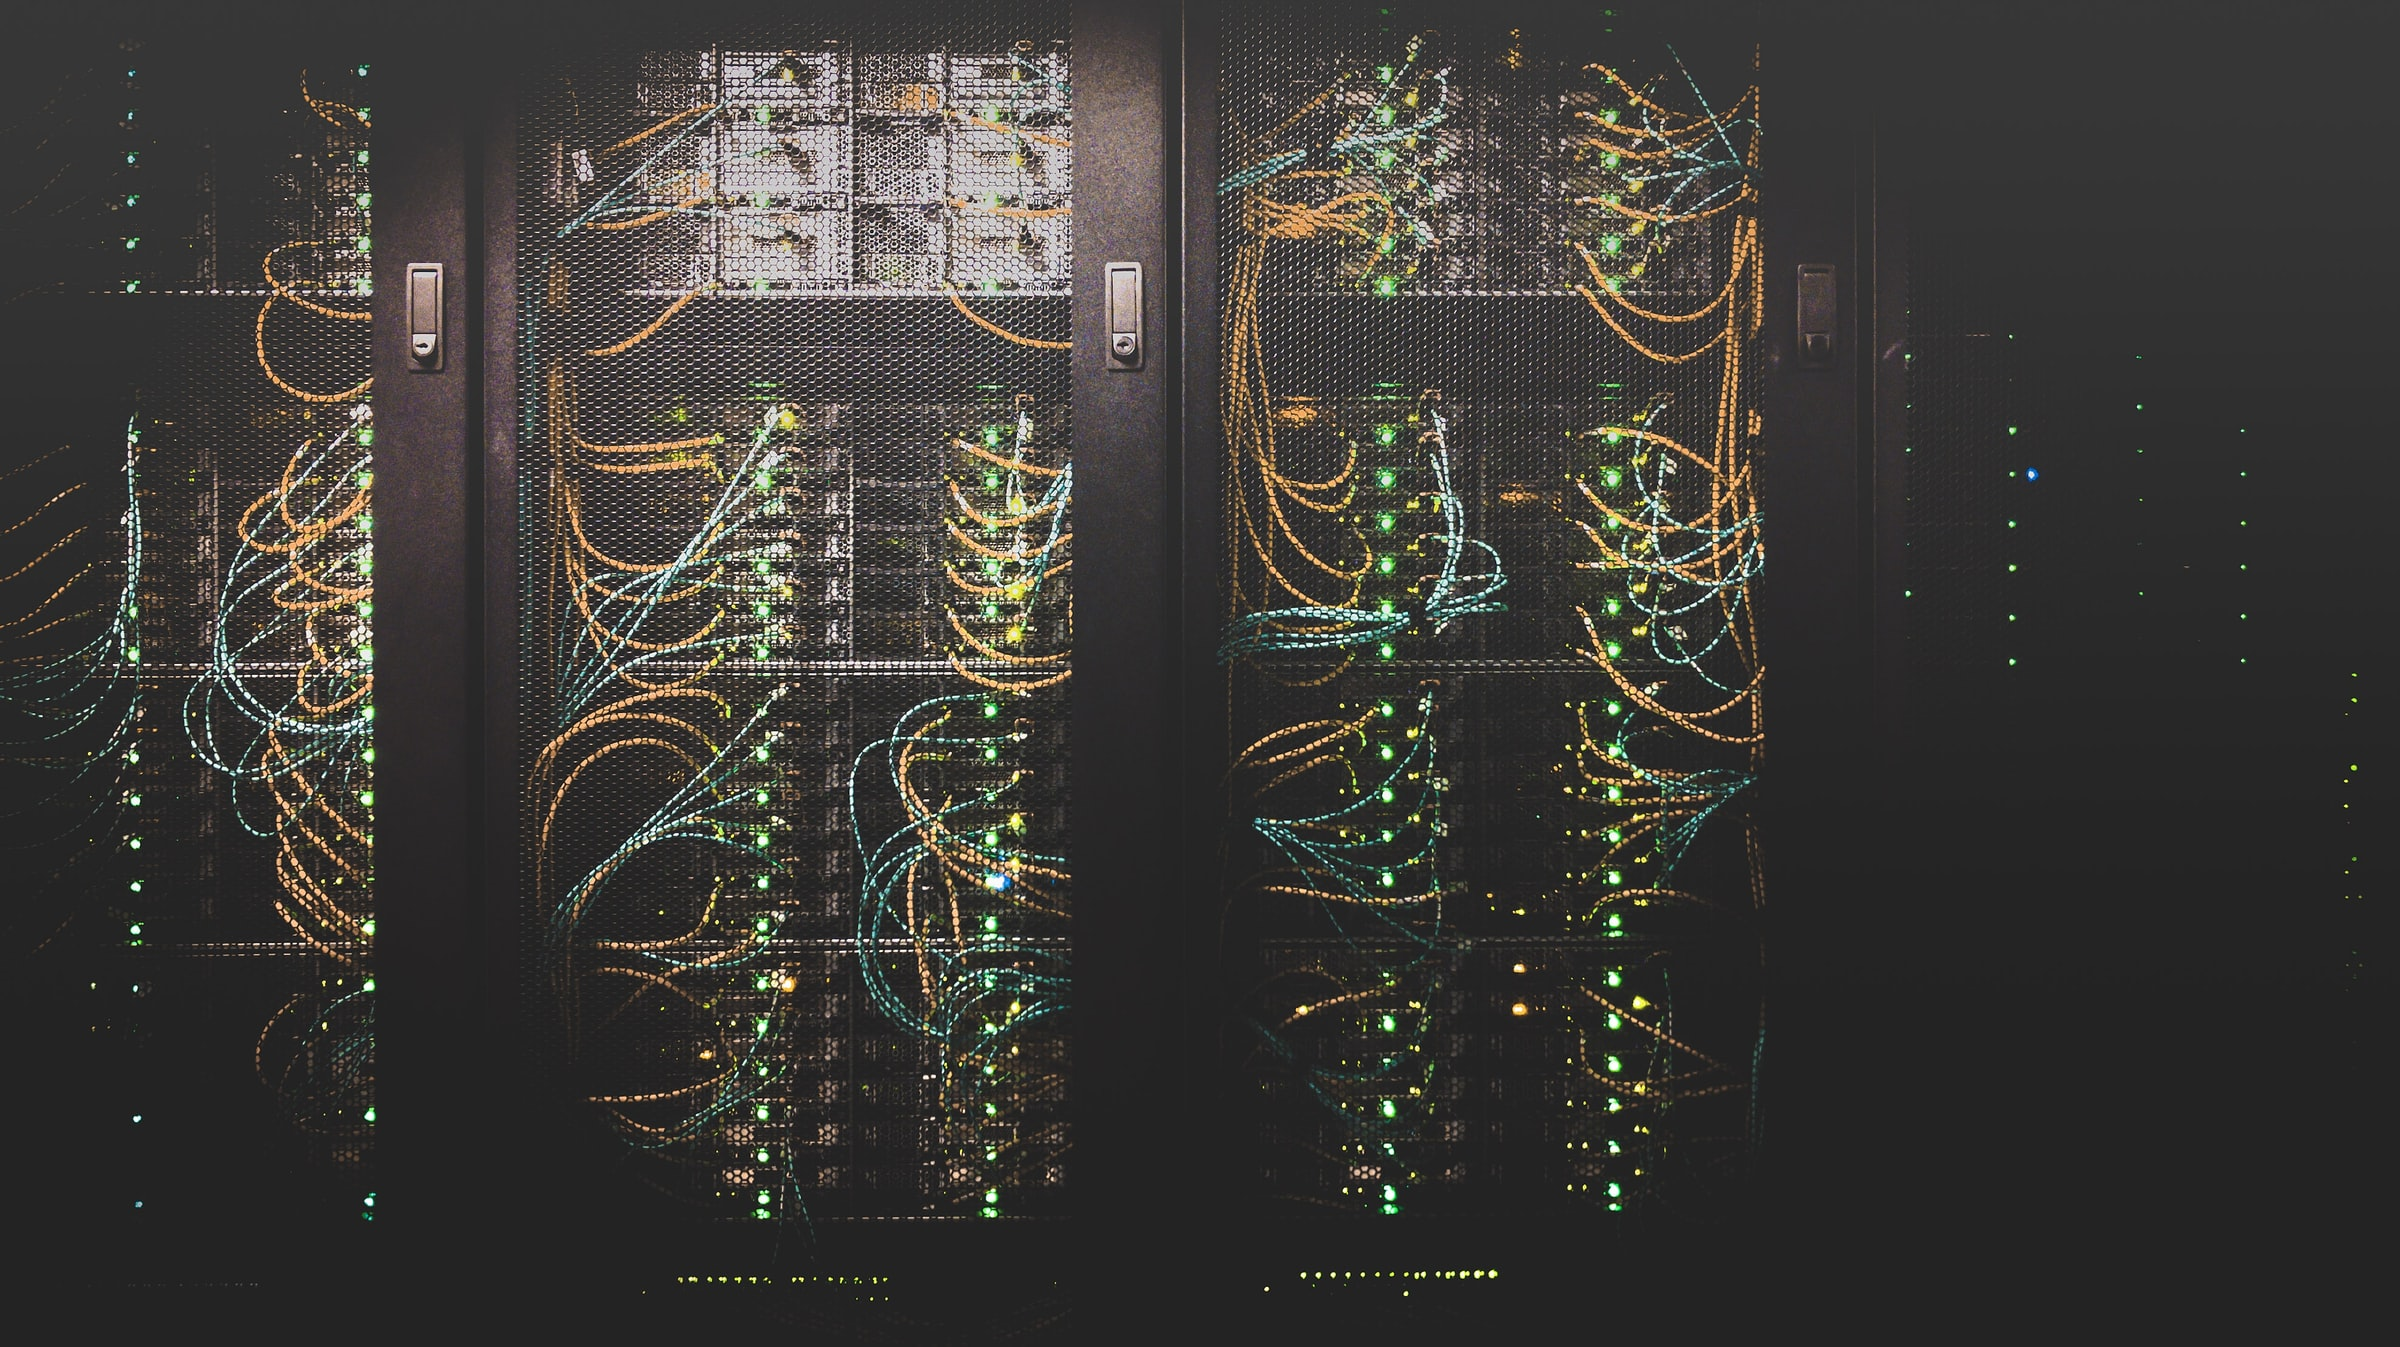 refurbished networking equipment